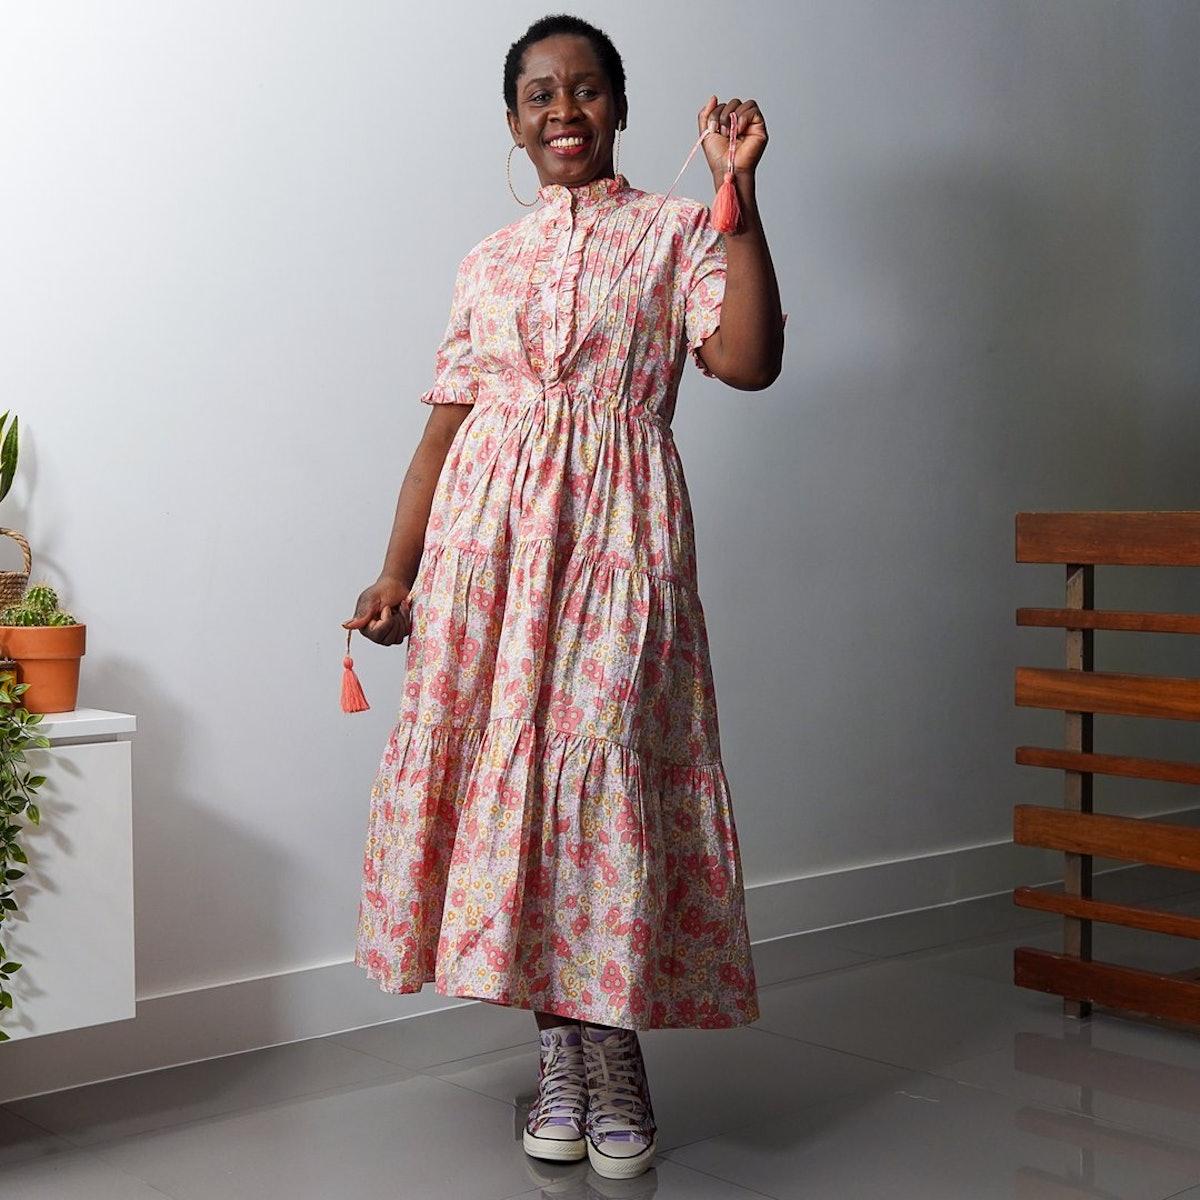 Flower Garden Brushed Cotton Dress